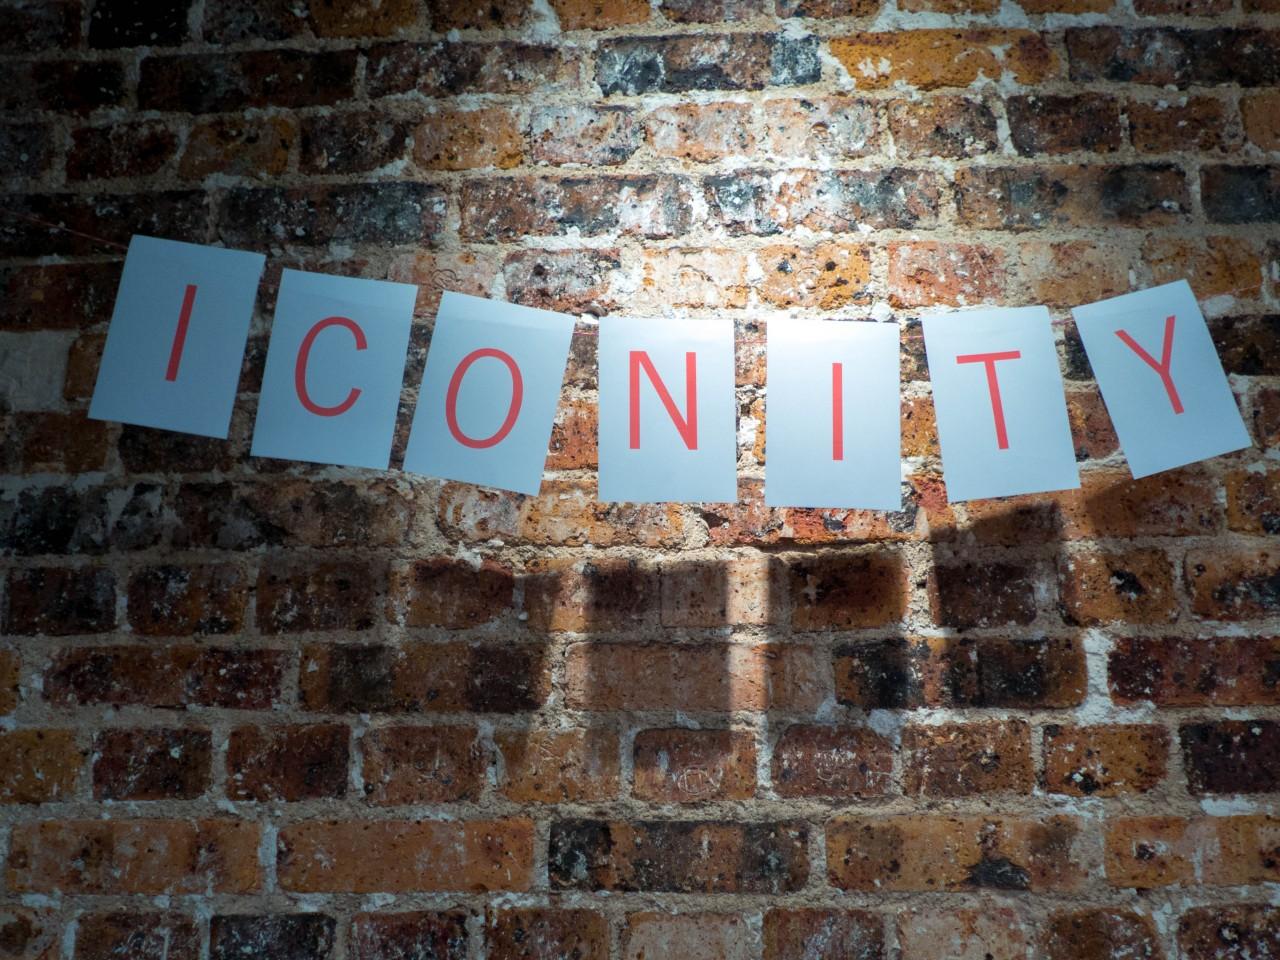 Iconity mode éthique collaborative